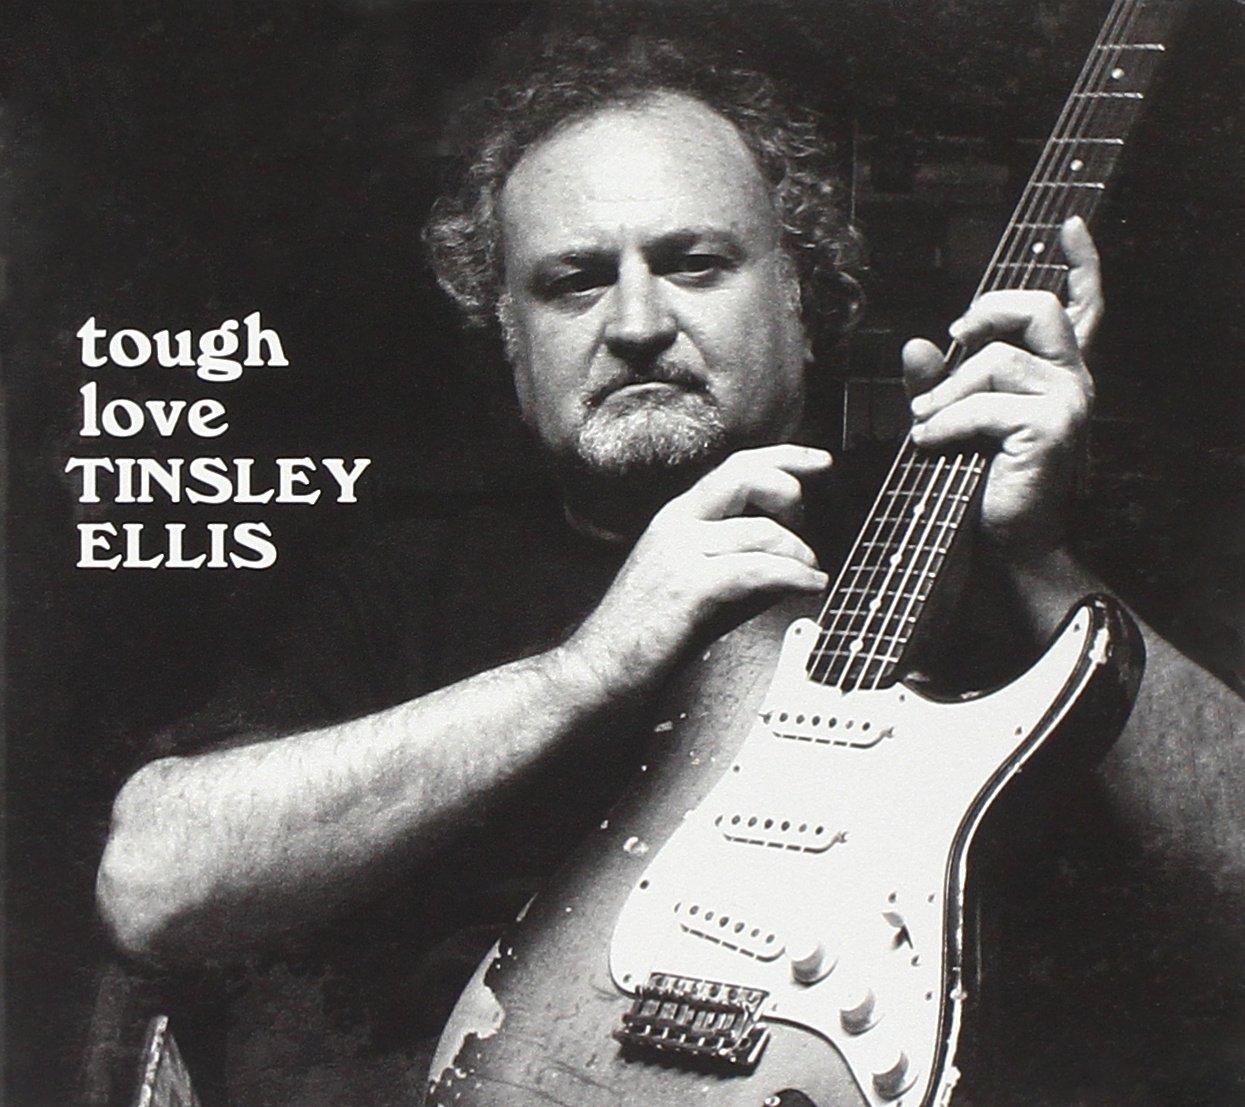 Tinsley Ellis – Tough Love (2015) 71h1iy9ArFL._SL1245_